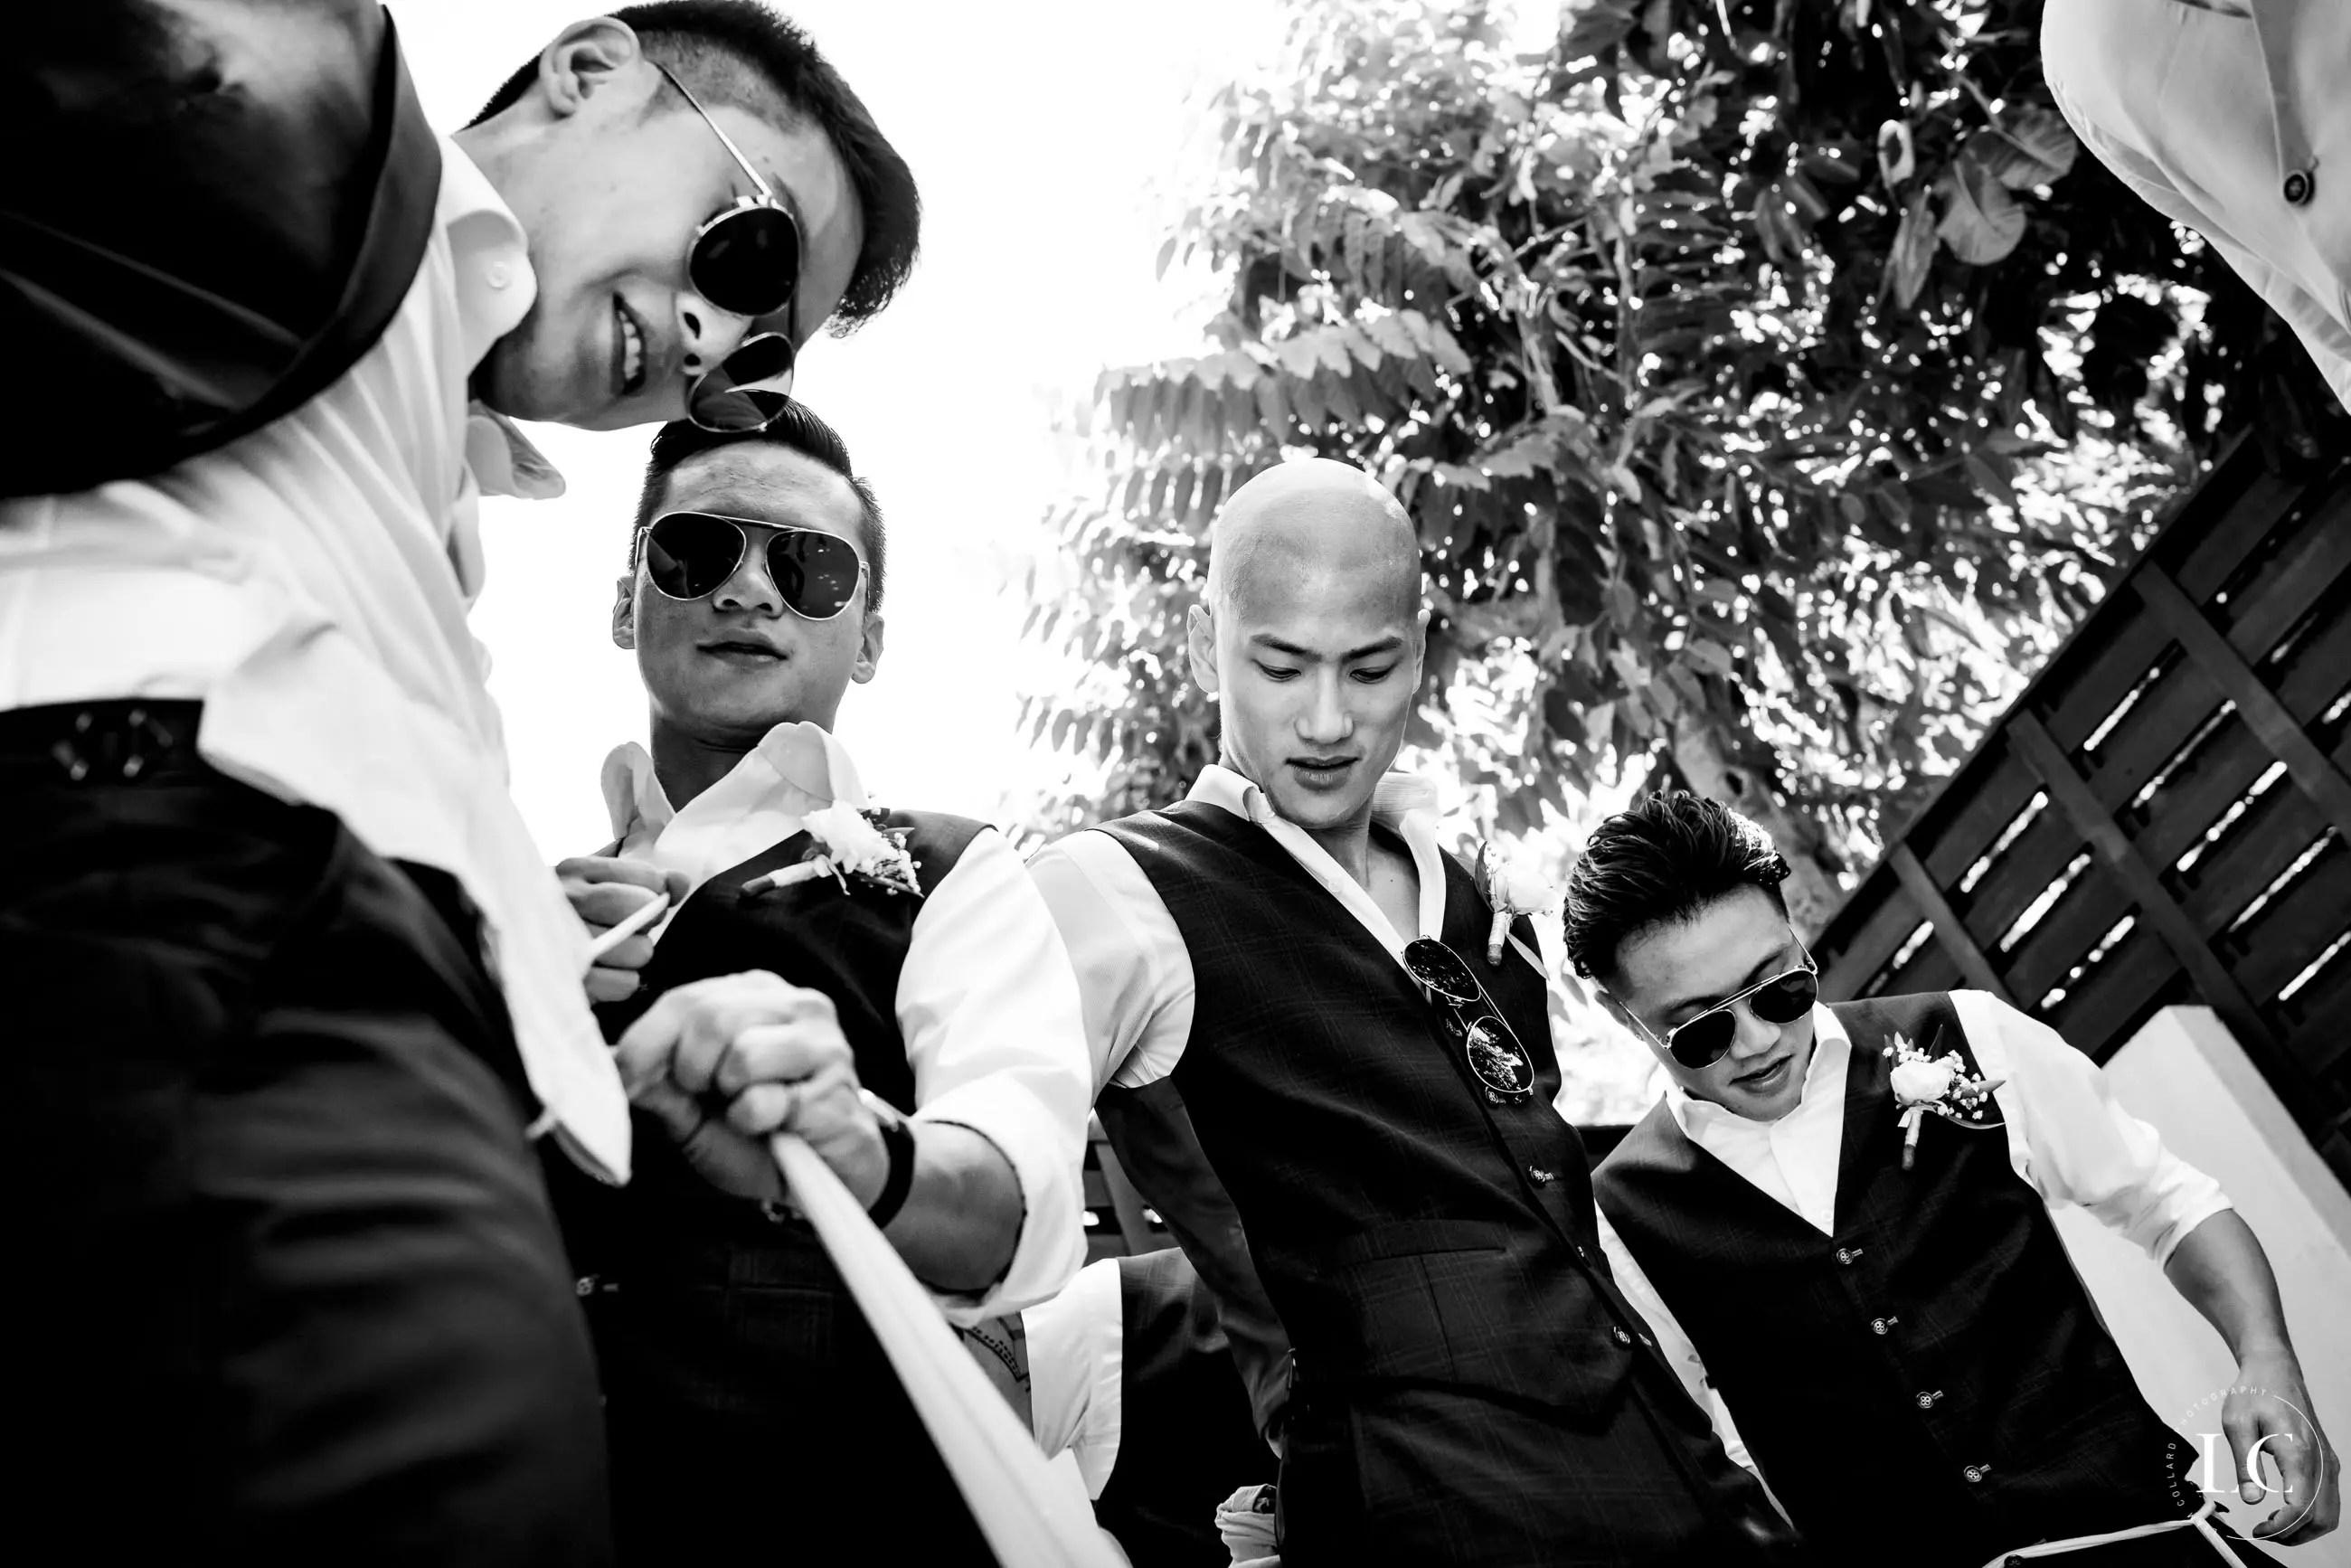 Groomsmen together at wedding